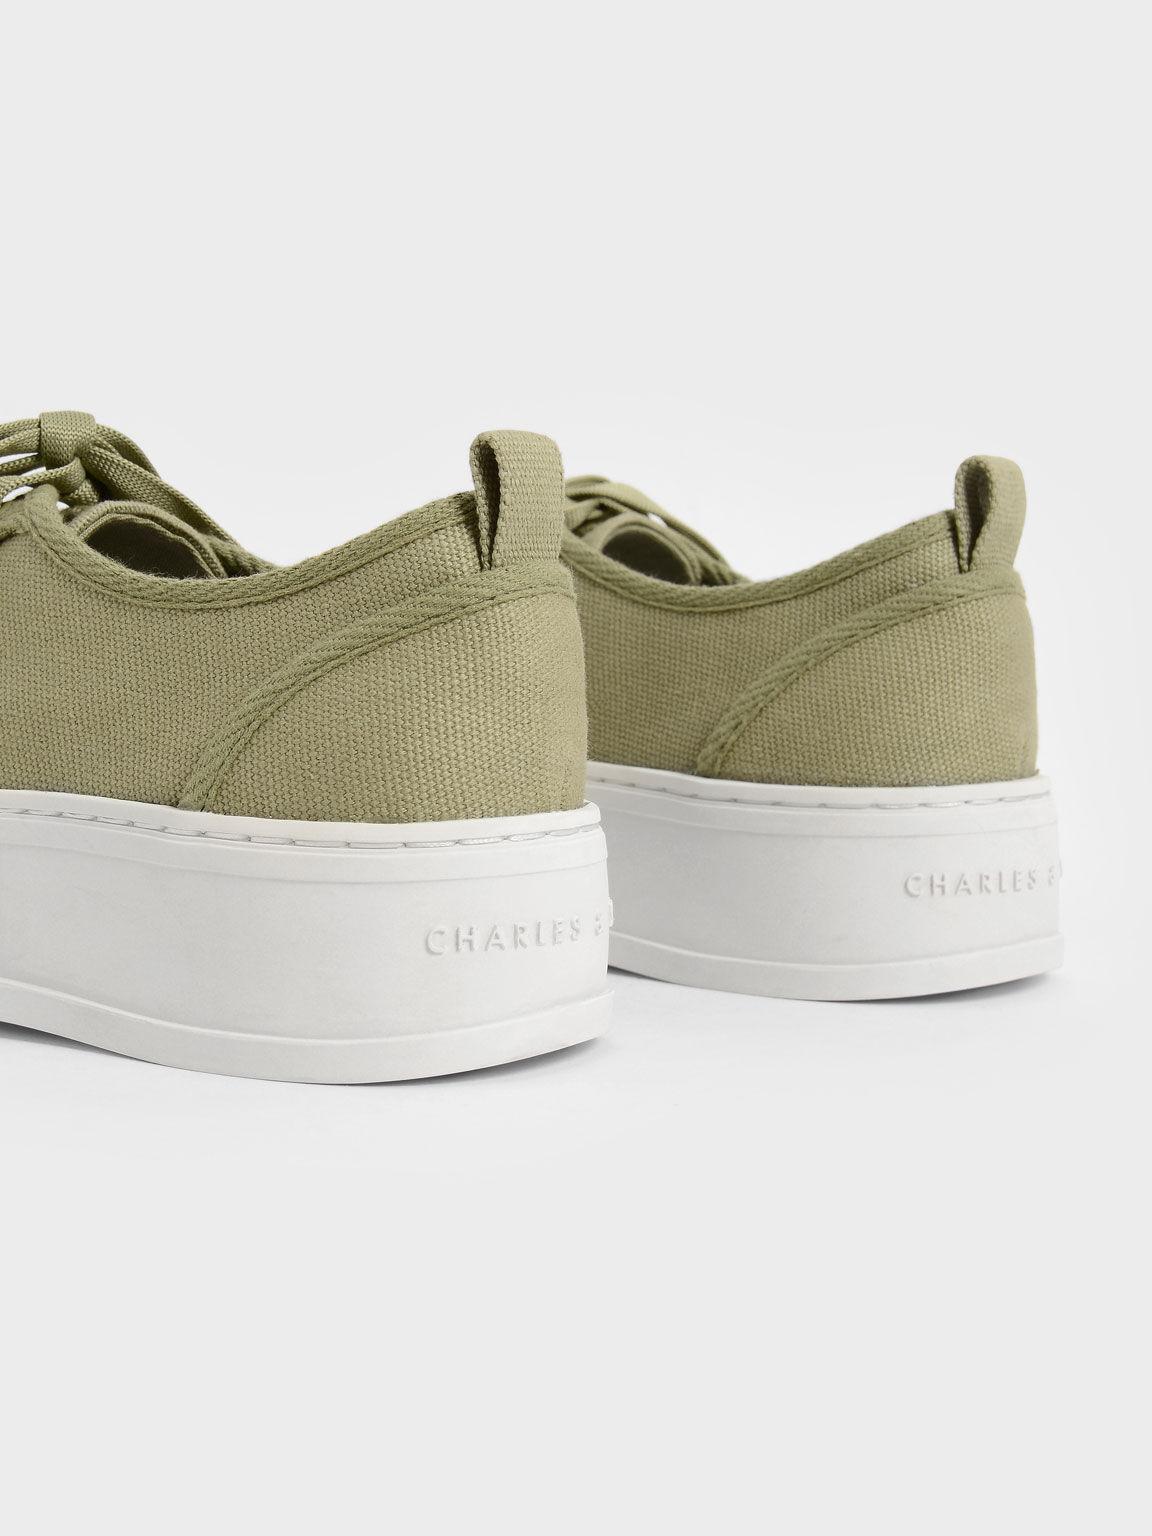 Organic Cotton Low-Top Sneakers, Green, hi-res